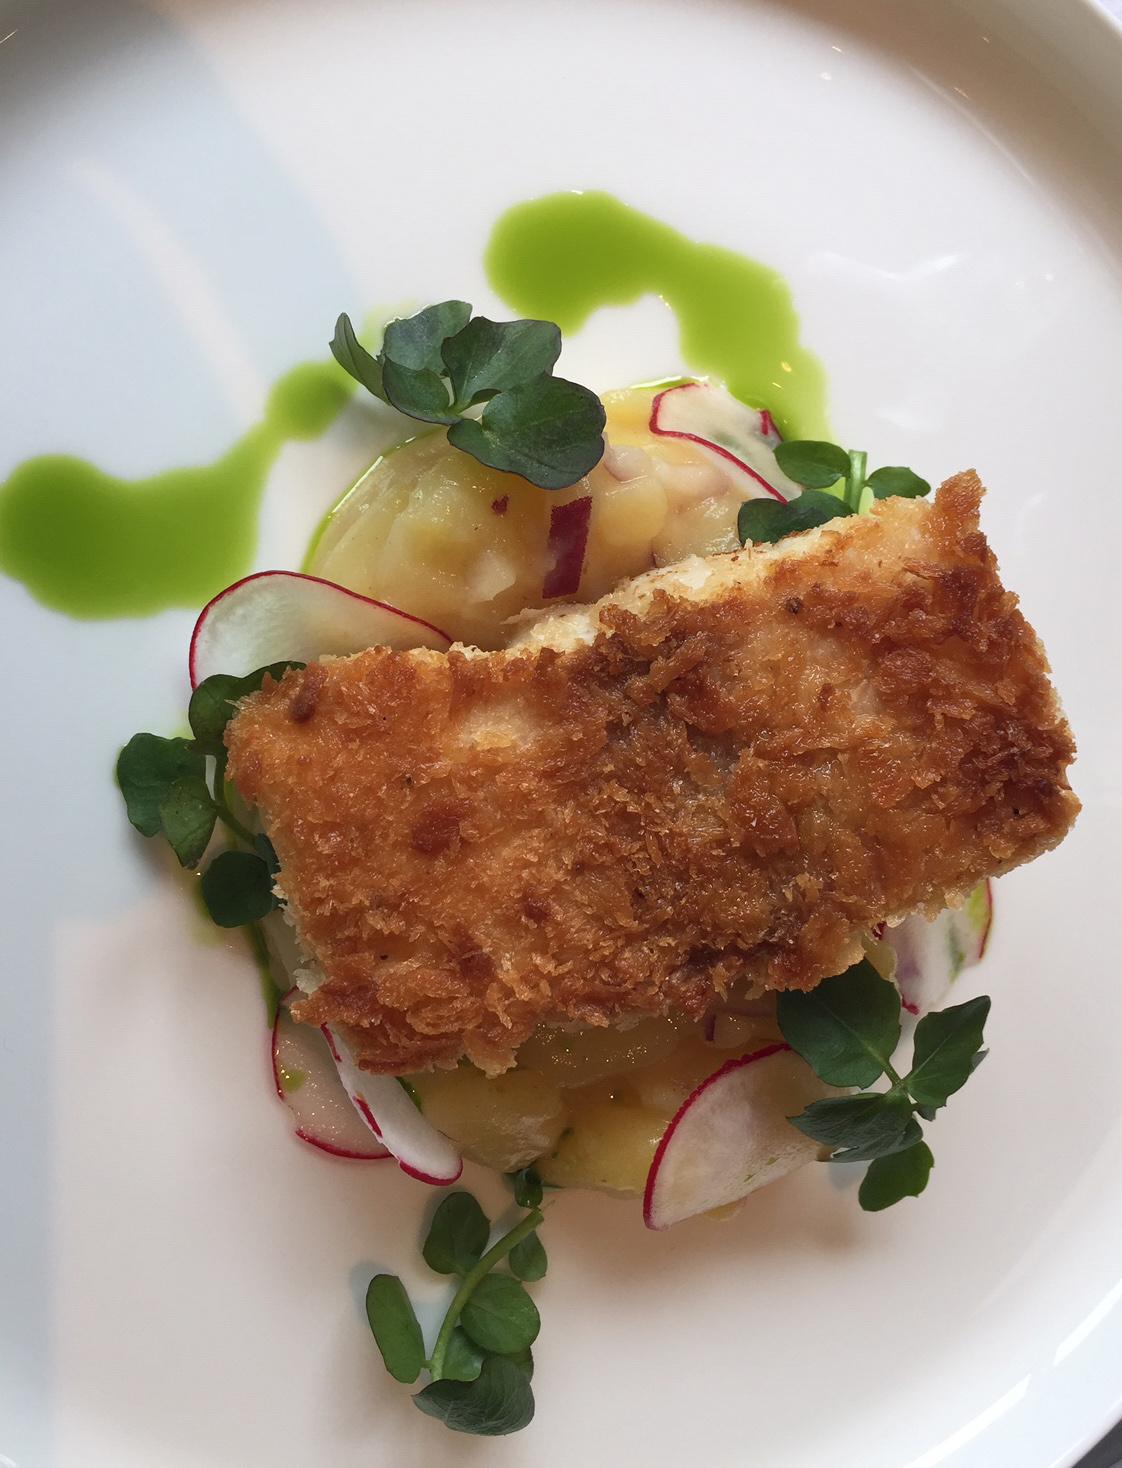 Saiblingsfilet auf Kartoffelsalat und Bachkresse